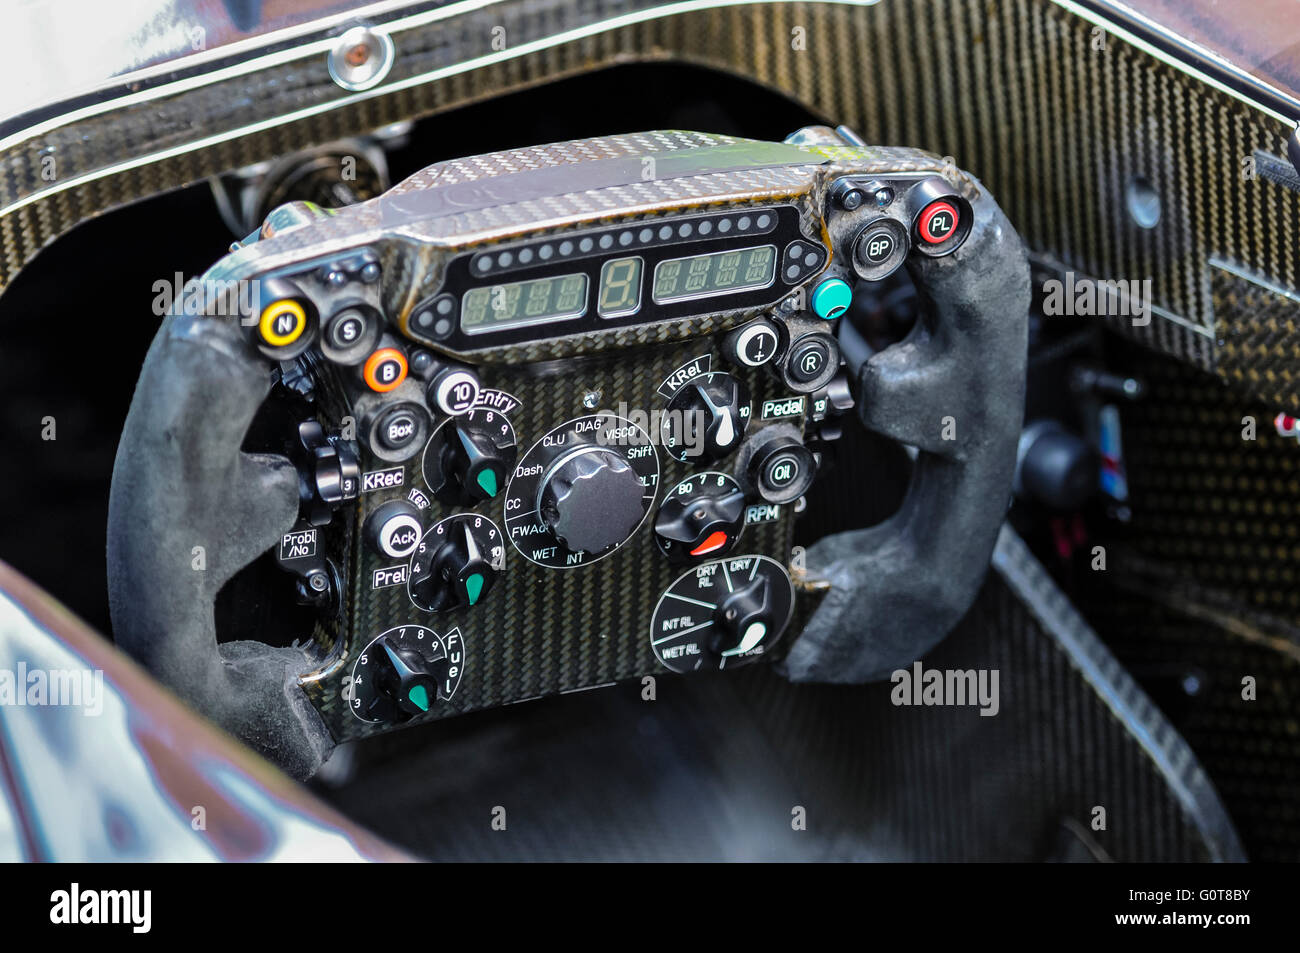 Multifunction steering wheel of a Sauber Formula 1 racing car. - Stock Image